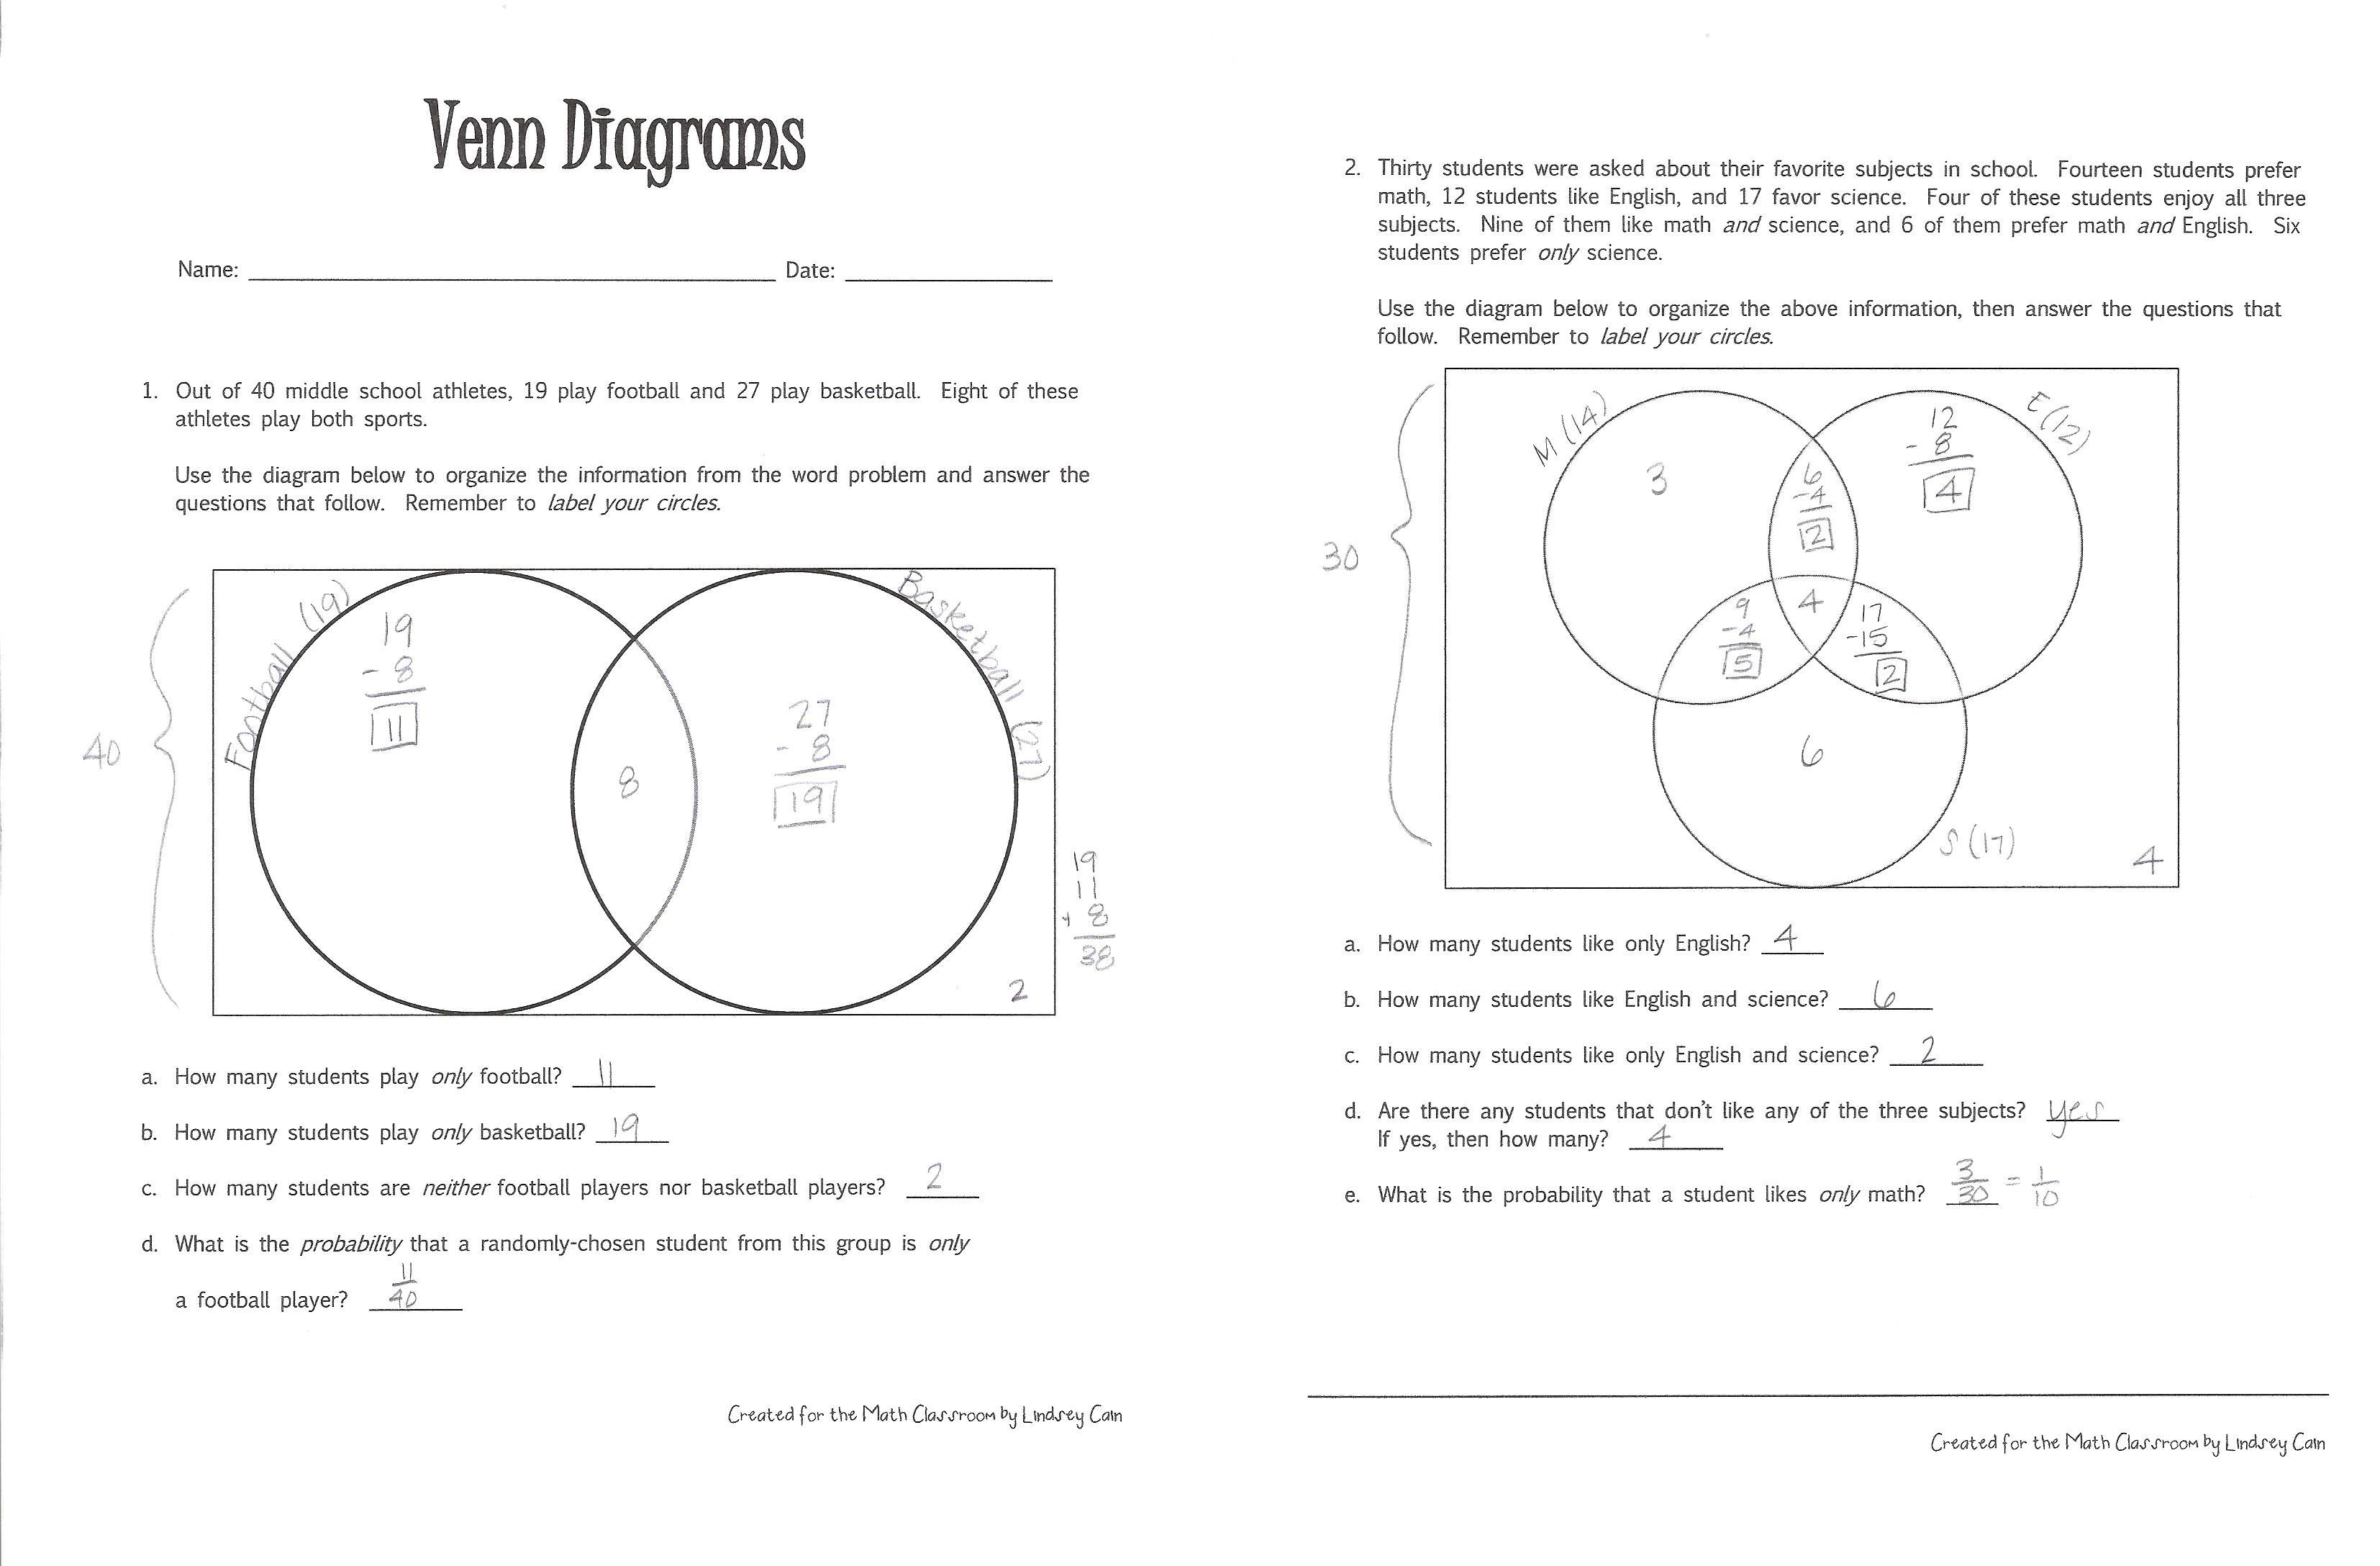 How To Make A Venn Diagram On Word Venn Diagrams Literacy Strategies For The Math Classroom